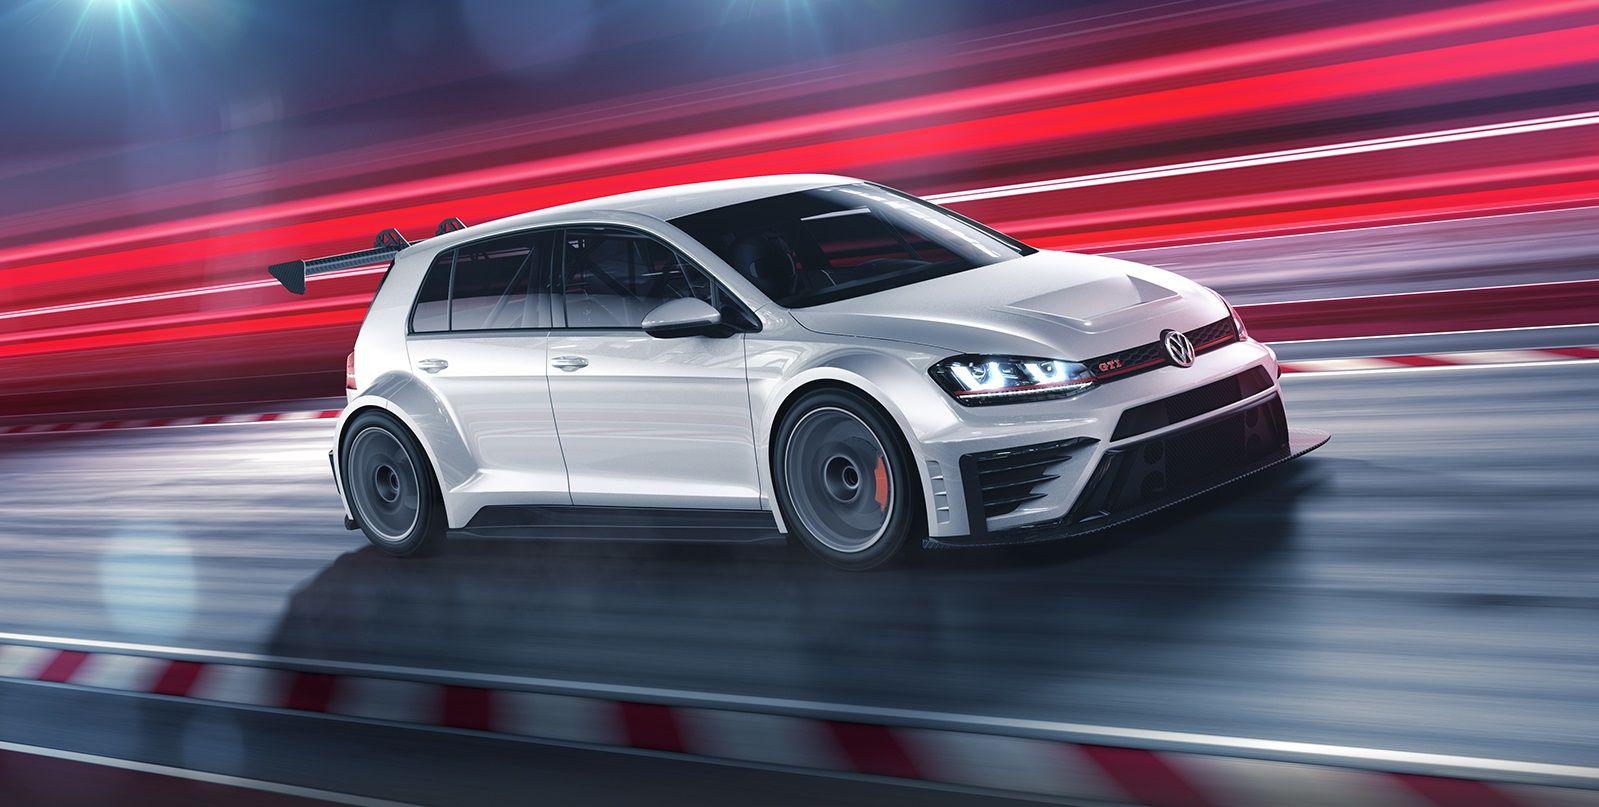 Bon VW Golf 6 Cabrio R R20 Ombouw Met Milltek Uitlaatsysteem En LED  Achterlichten. Http://www.procartuning.nl | VW Tuning | Pinterest | Vw